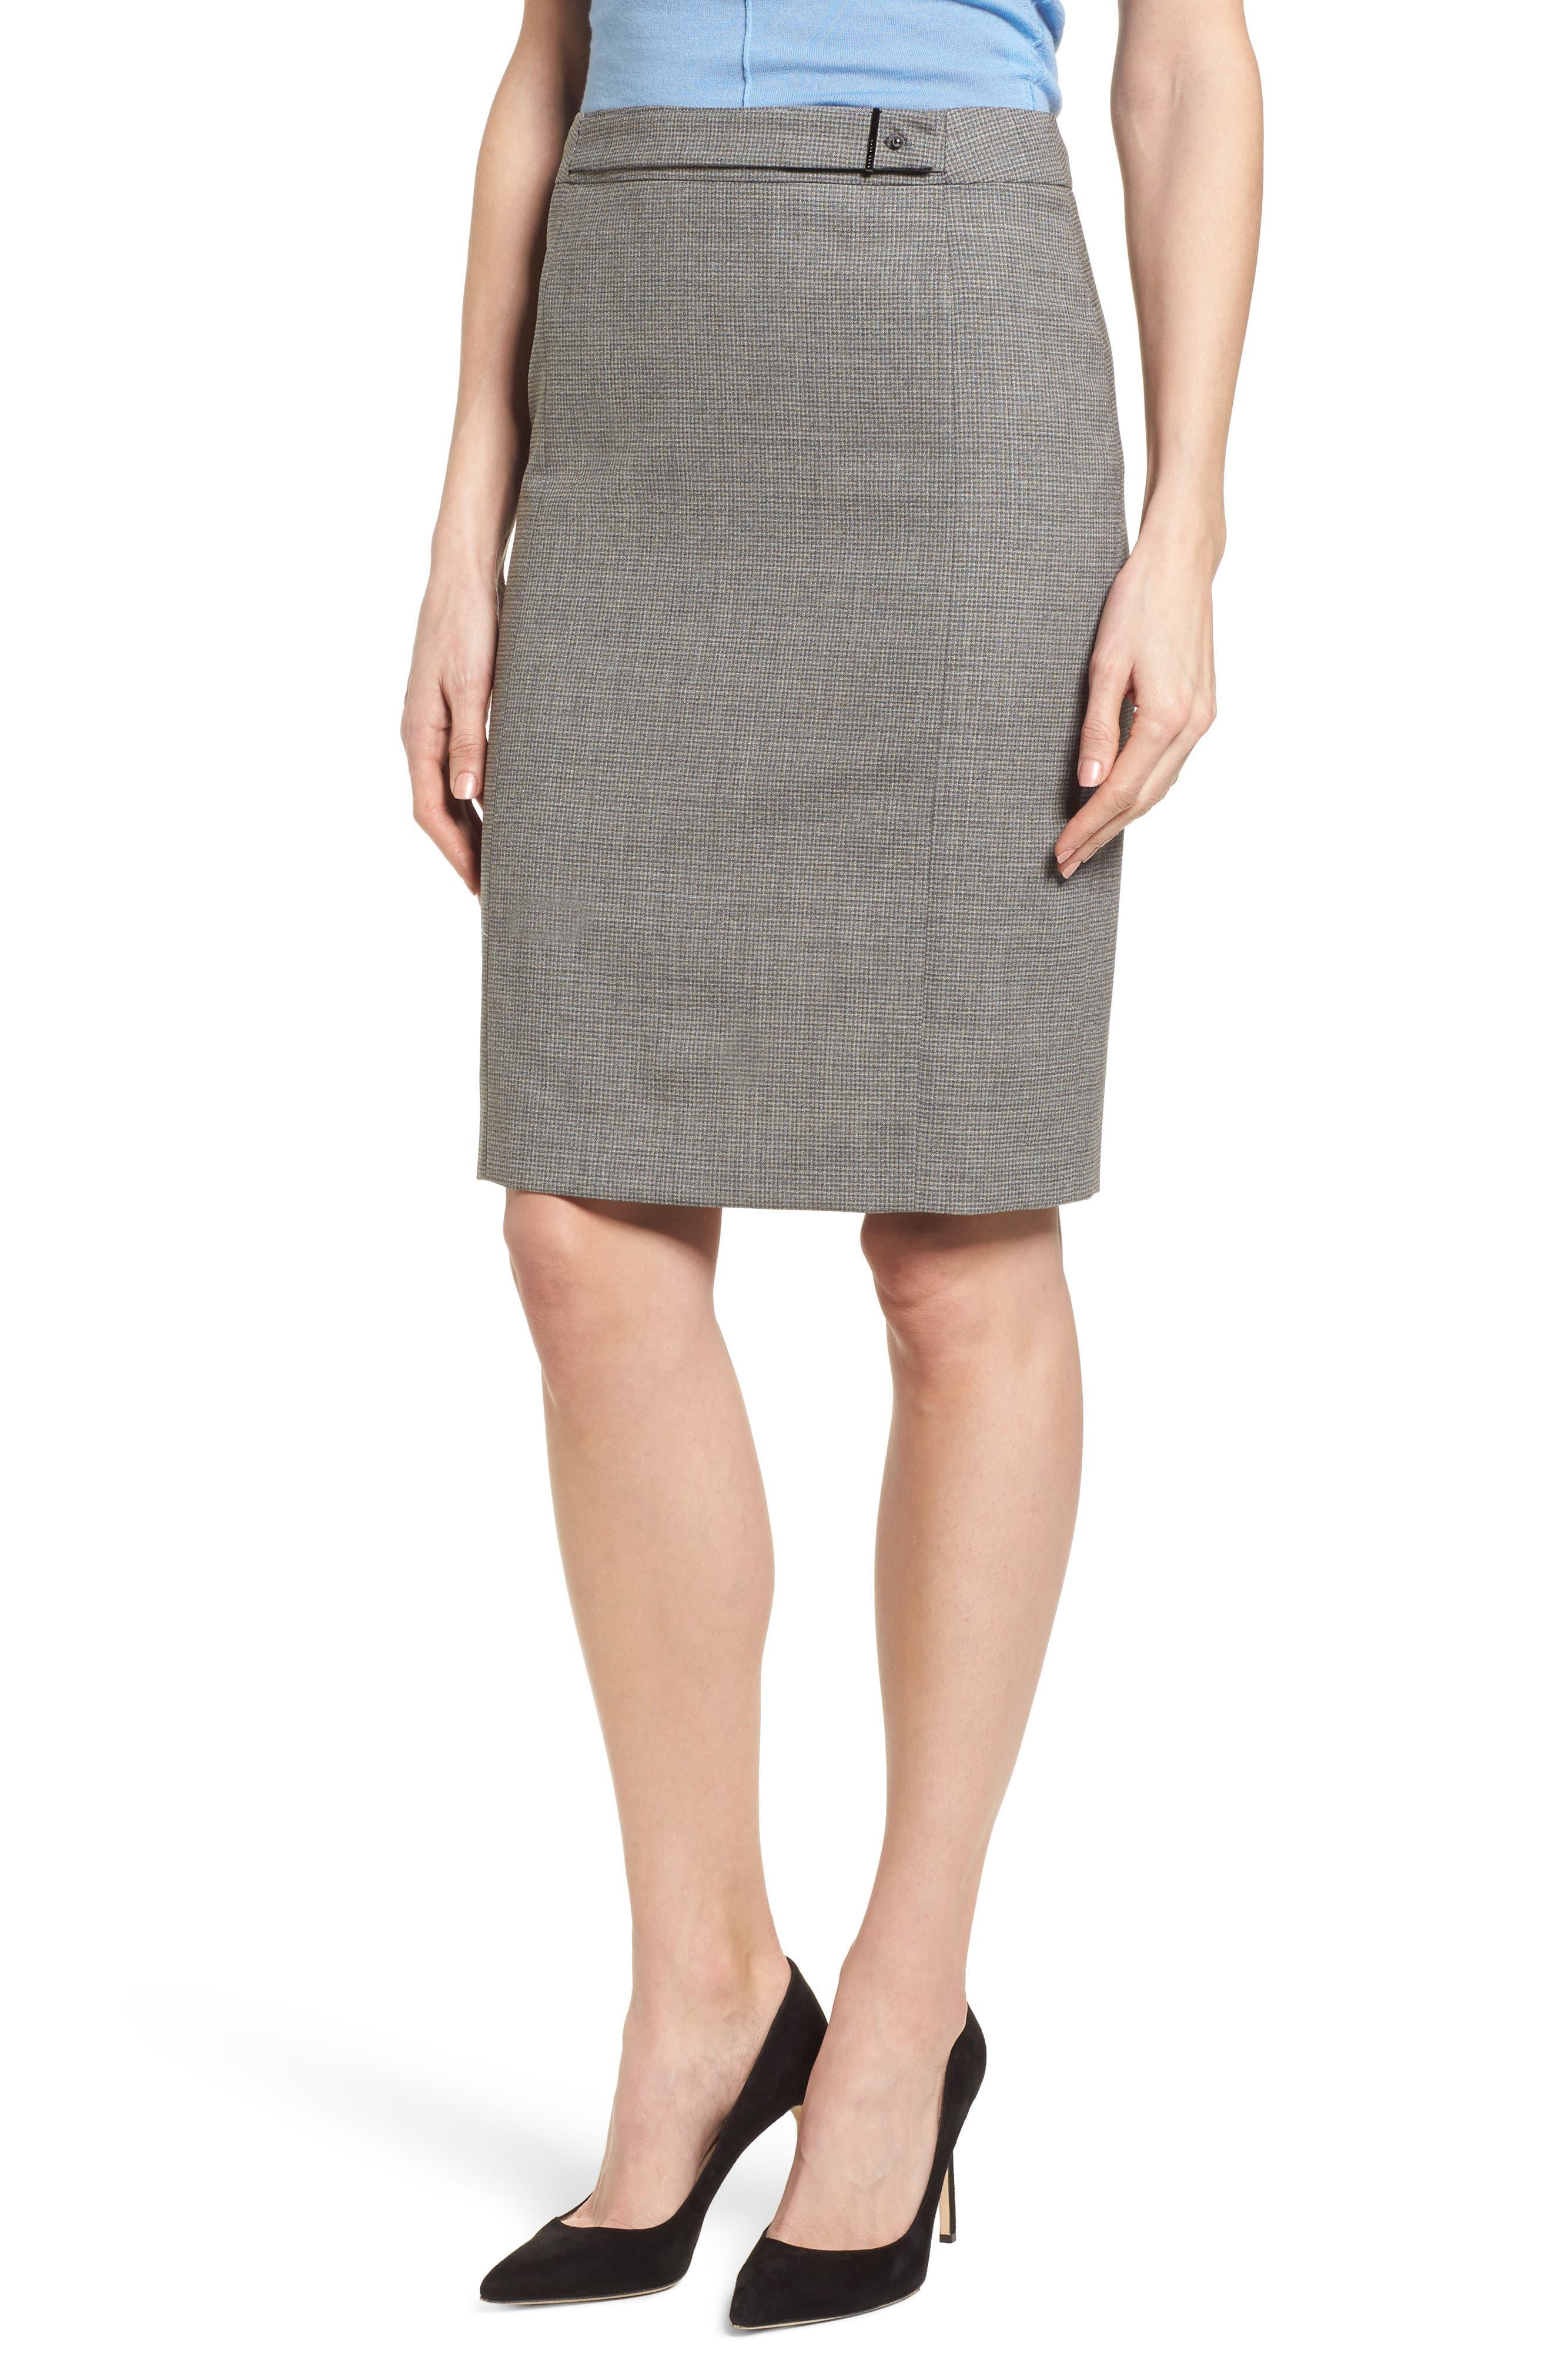 Vewisa Check Wool Suit Skirt,                         Main,                         color, Cozy Grey Melange Fantasy